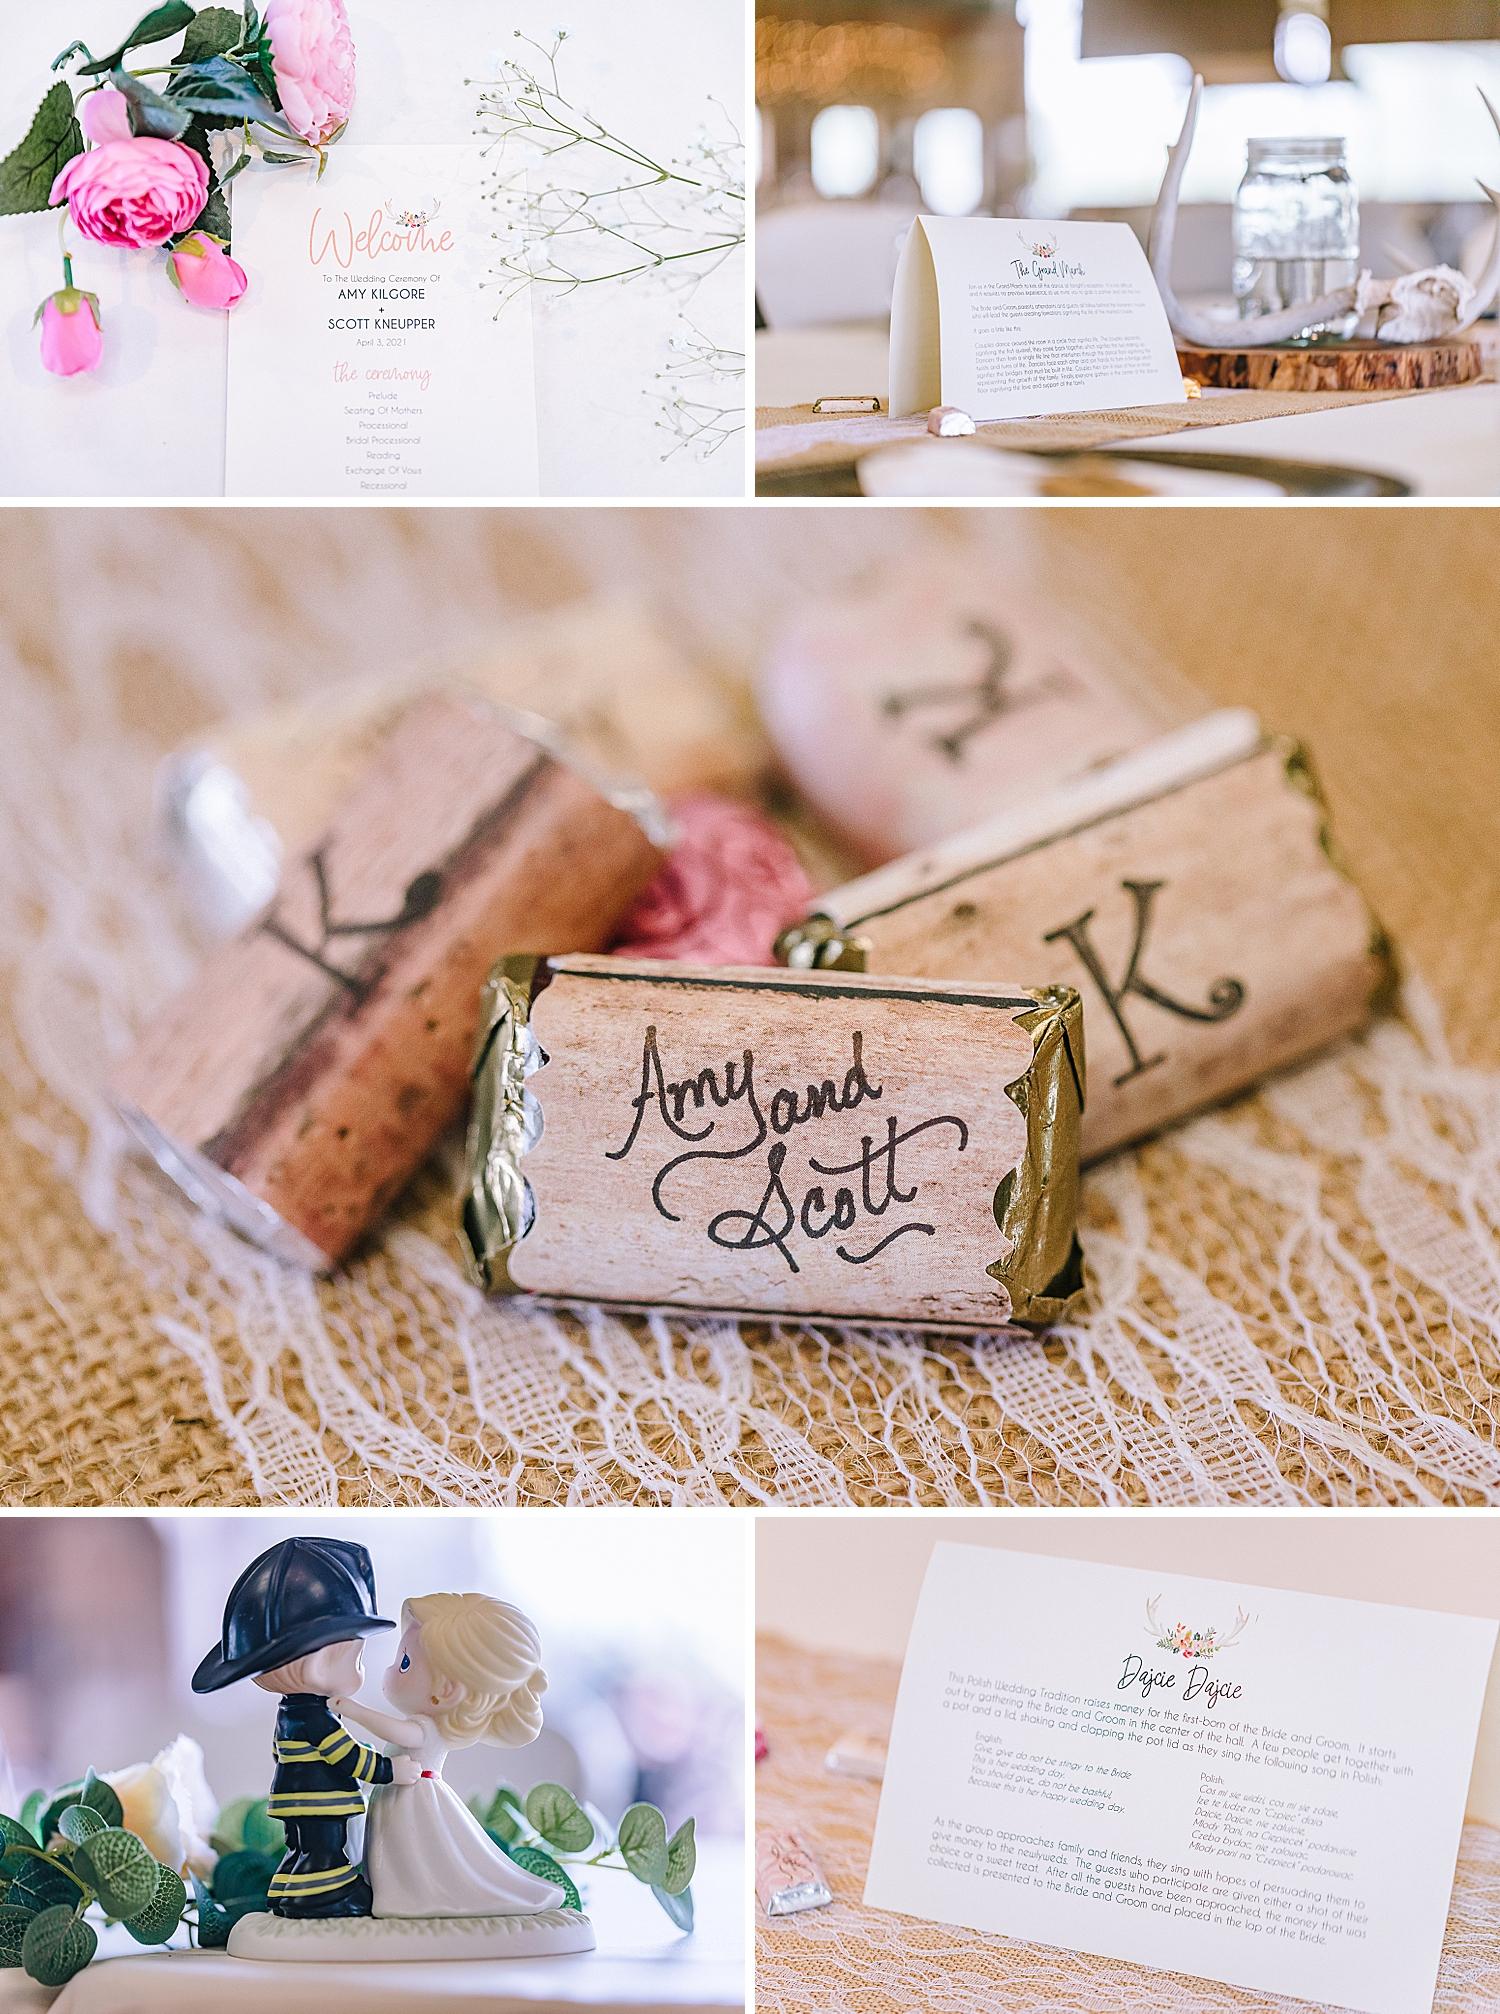 Rio-Cibilo-Ranch-Marion-Texas-Wedding-Rustic-Blush-Rose-Quartz-Details-Carly-Barton-Photography_0003.jpg